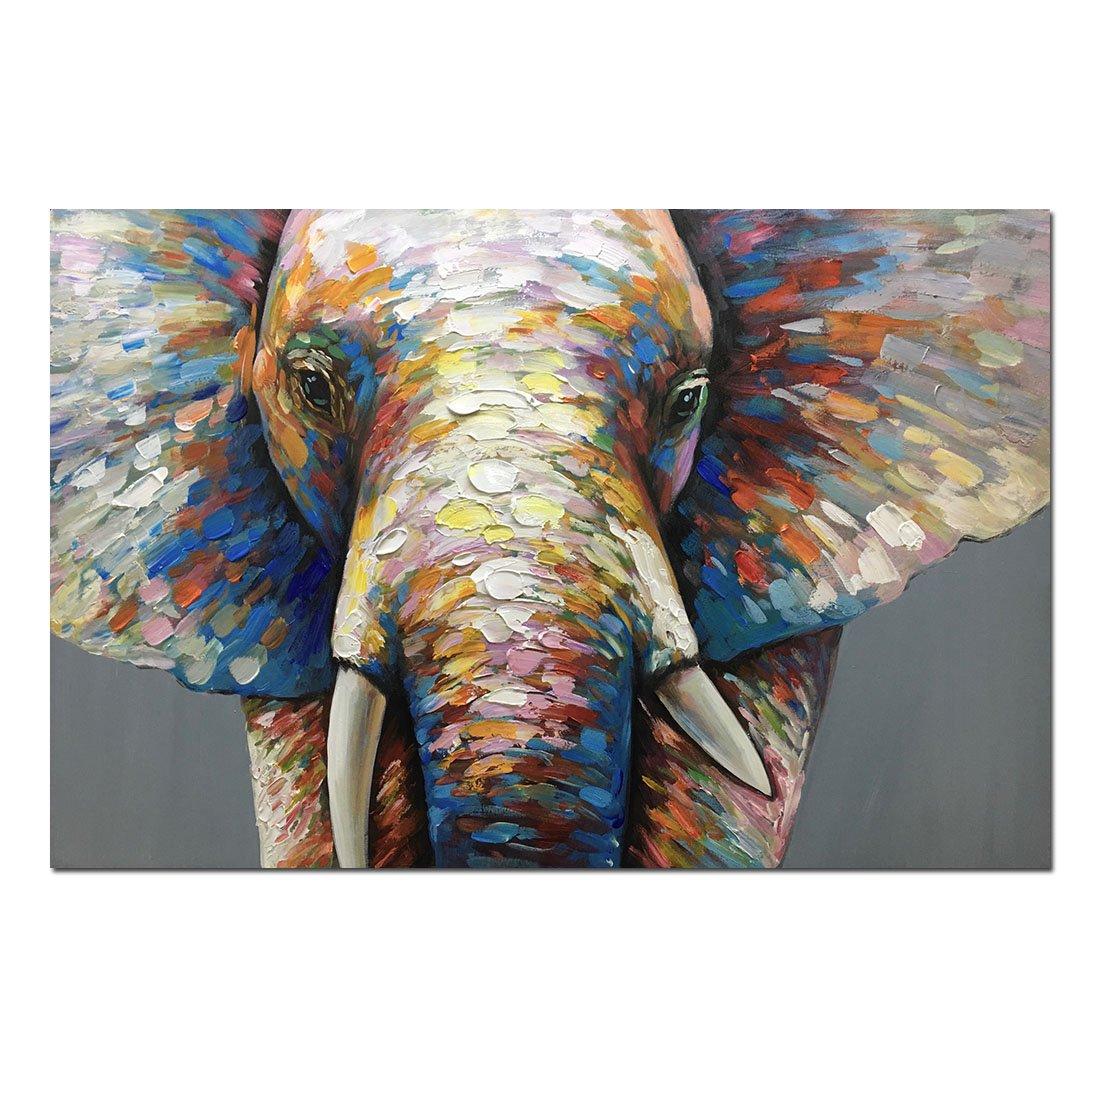 Fasdi-ART Oil Painting 100% Hand-Painted Art Knife Decoration Abstract Nice Colorful Animal Elephant 60X90CM on Wood Frame